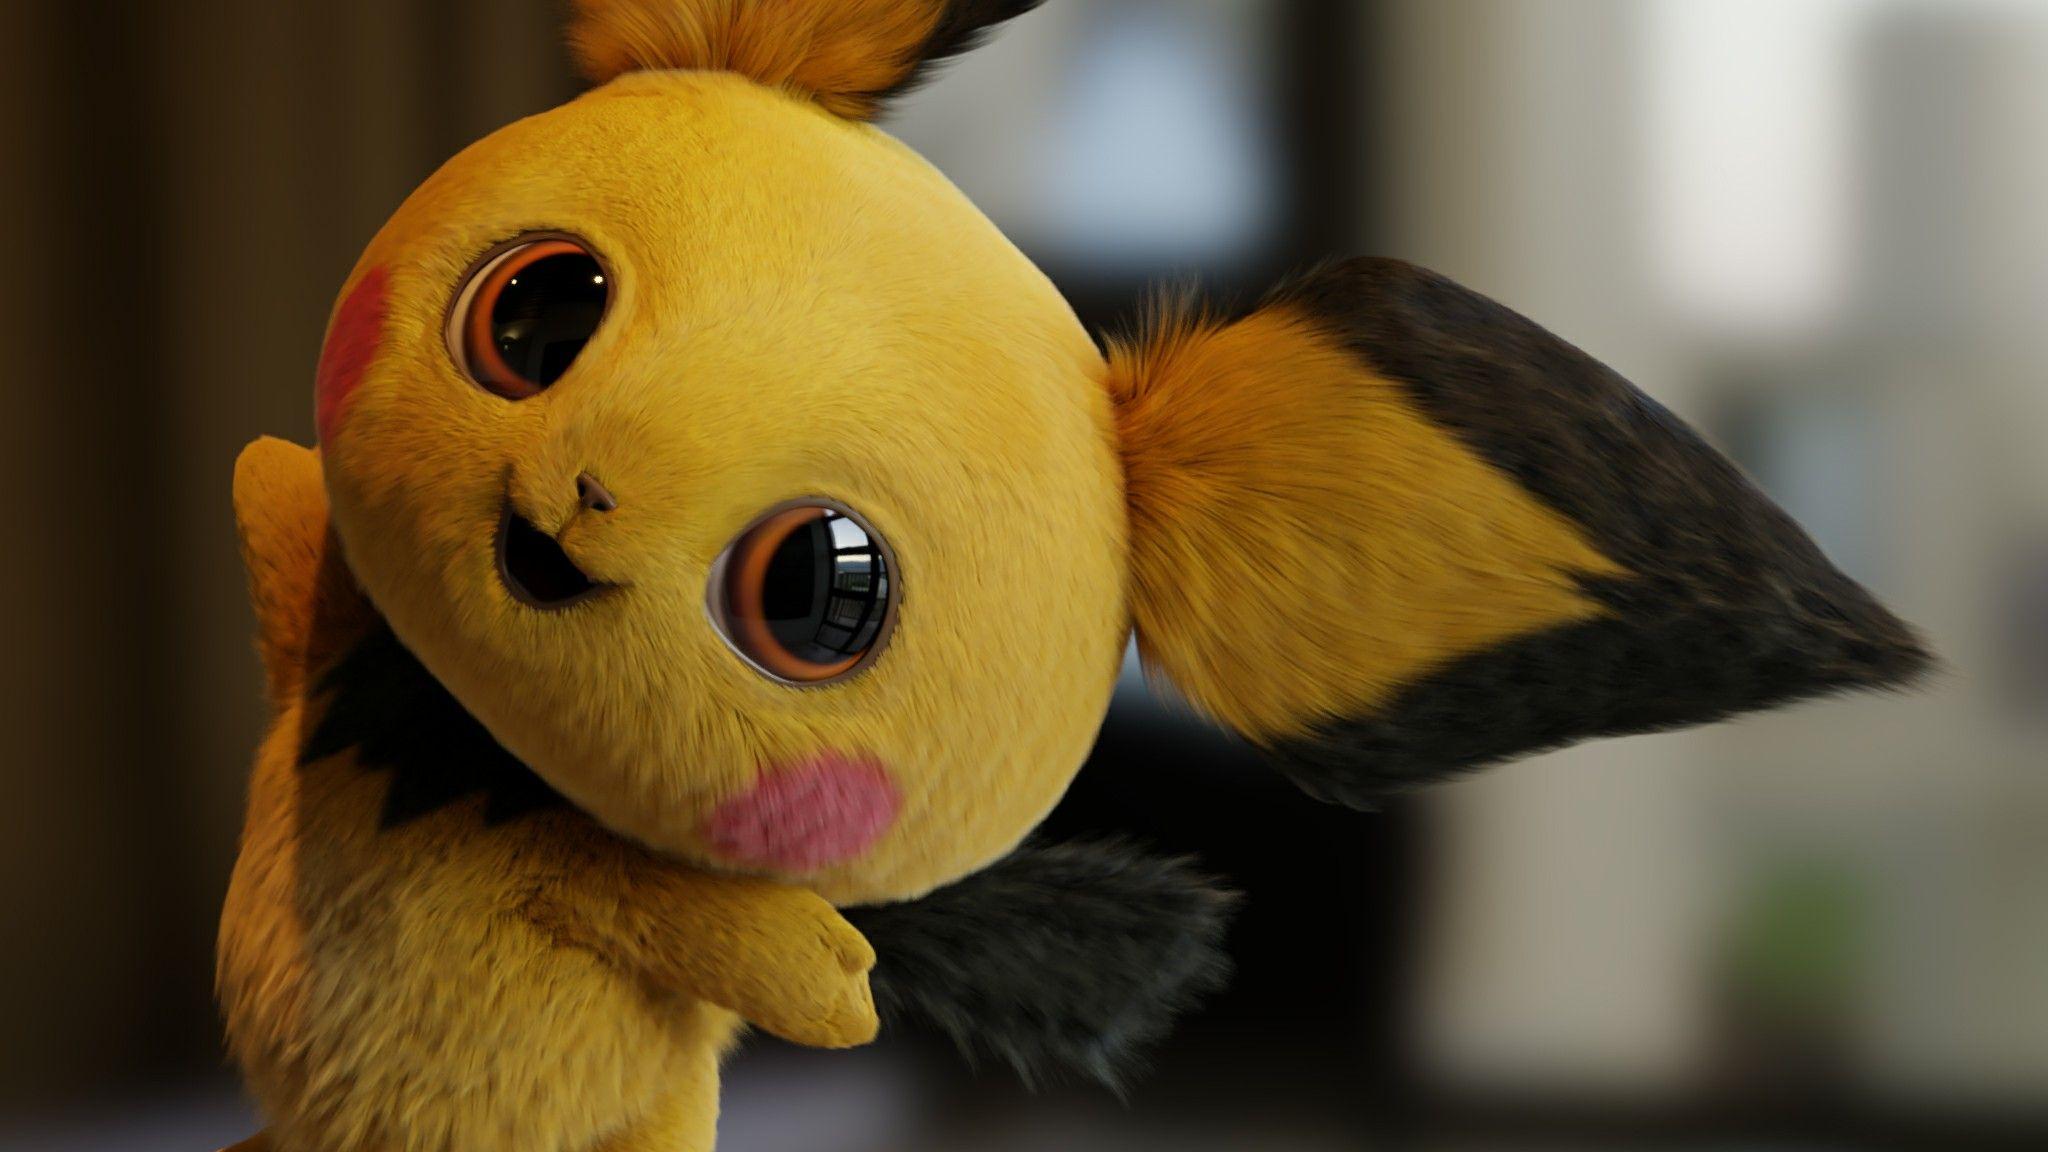 Pokemon Detective Pikachu Pichu Pikachu Wallpaper Pikachu